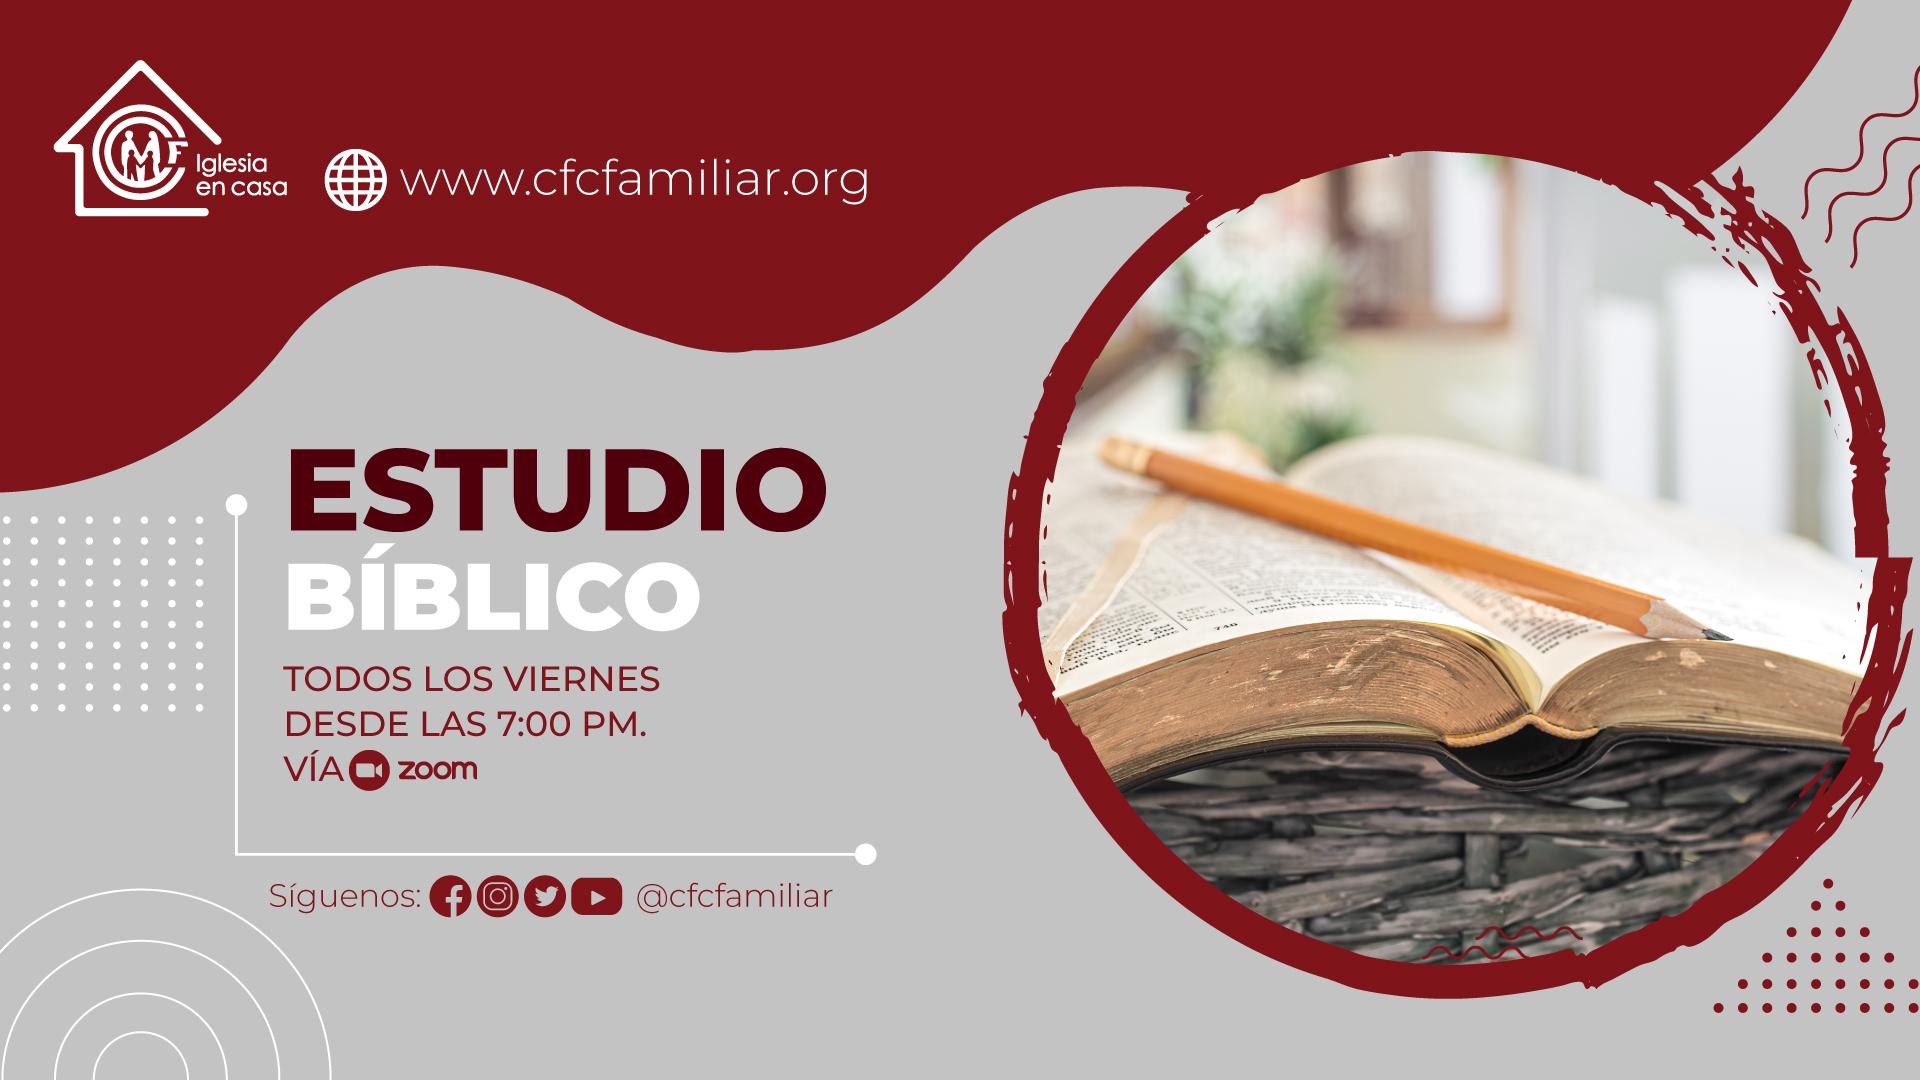 ESTUDIO BIBLICO 2021